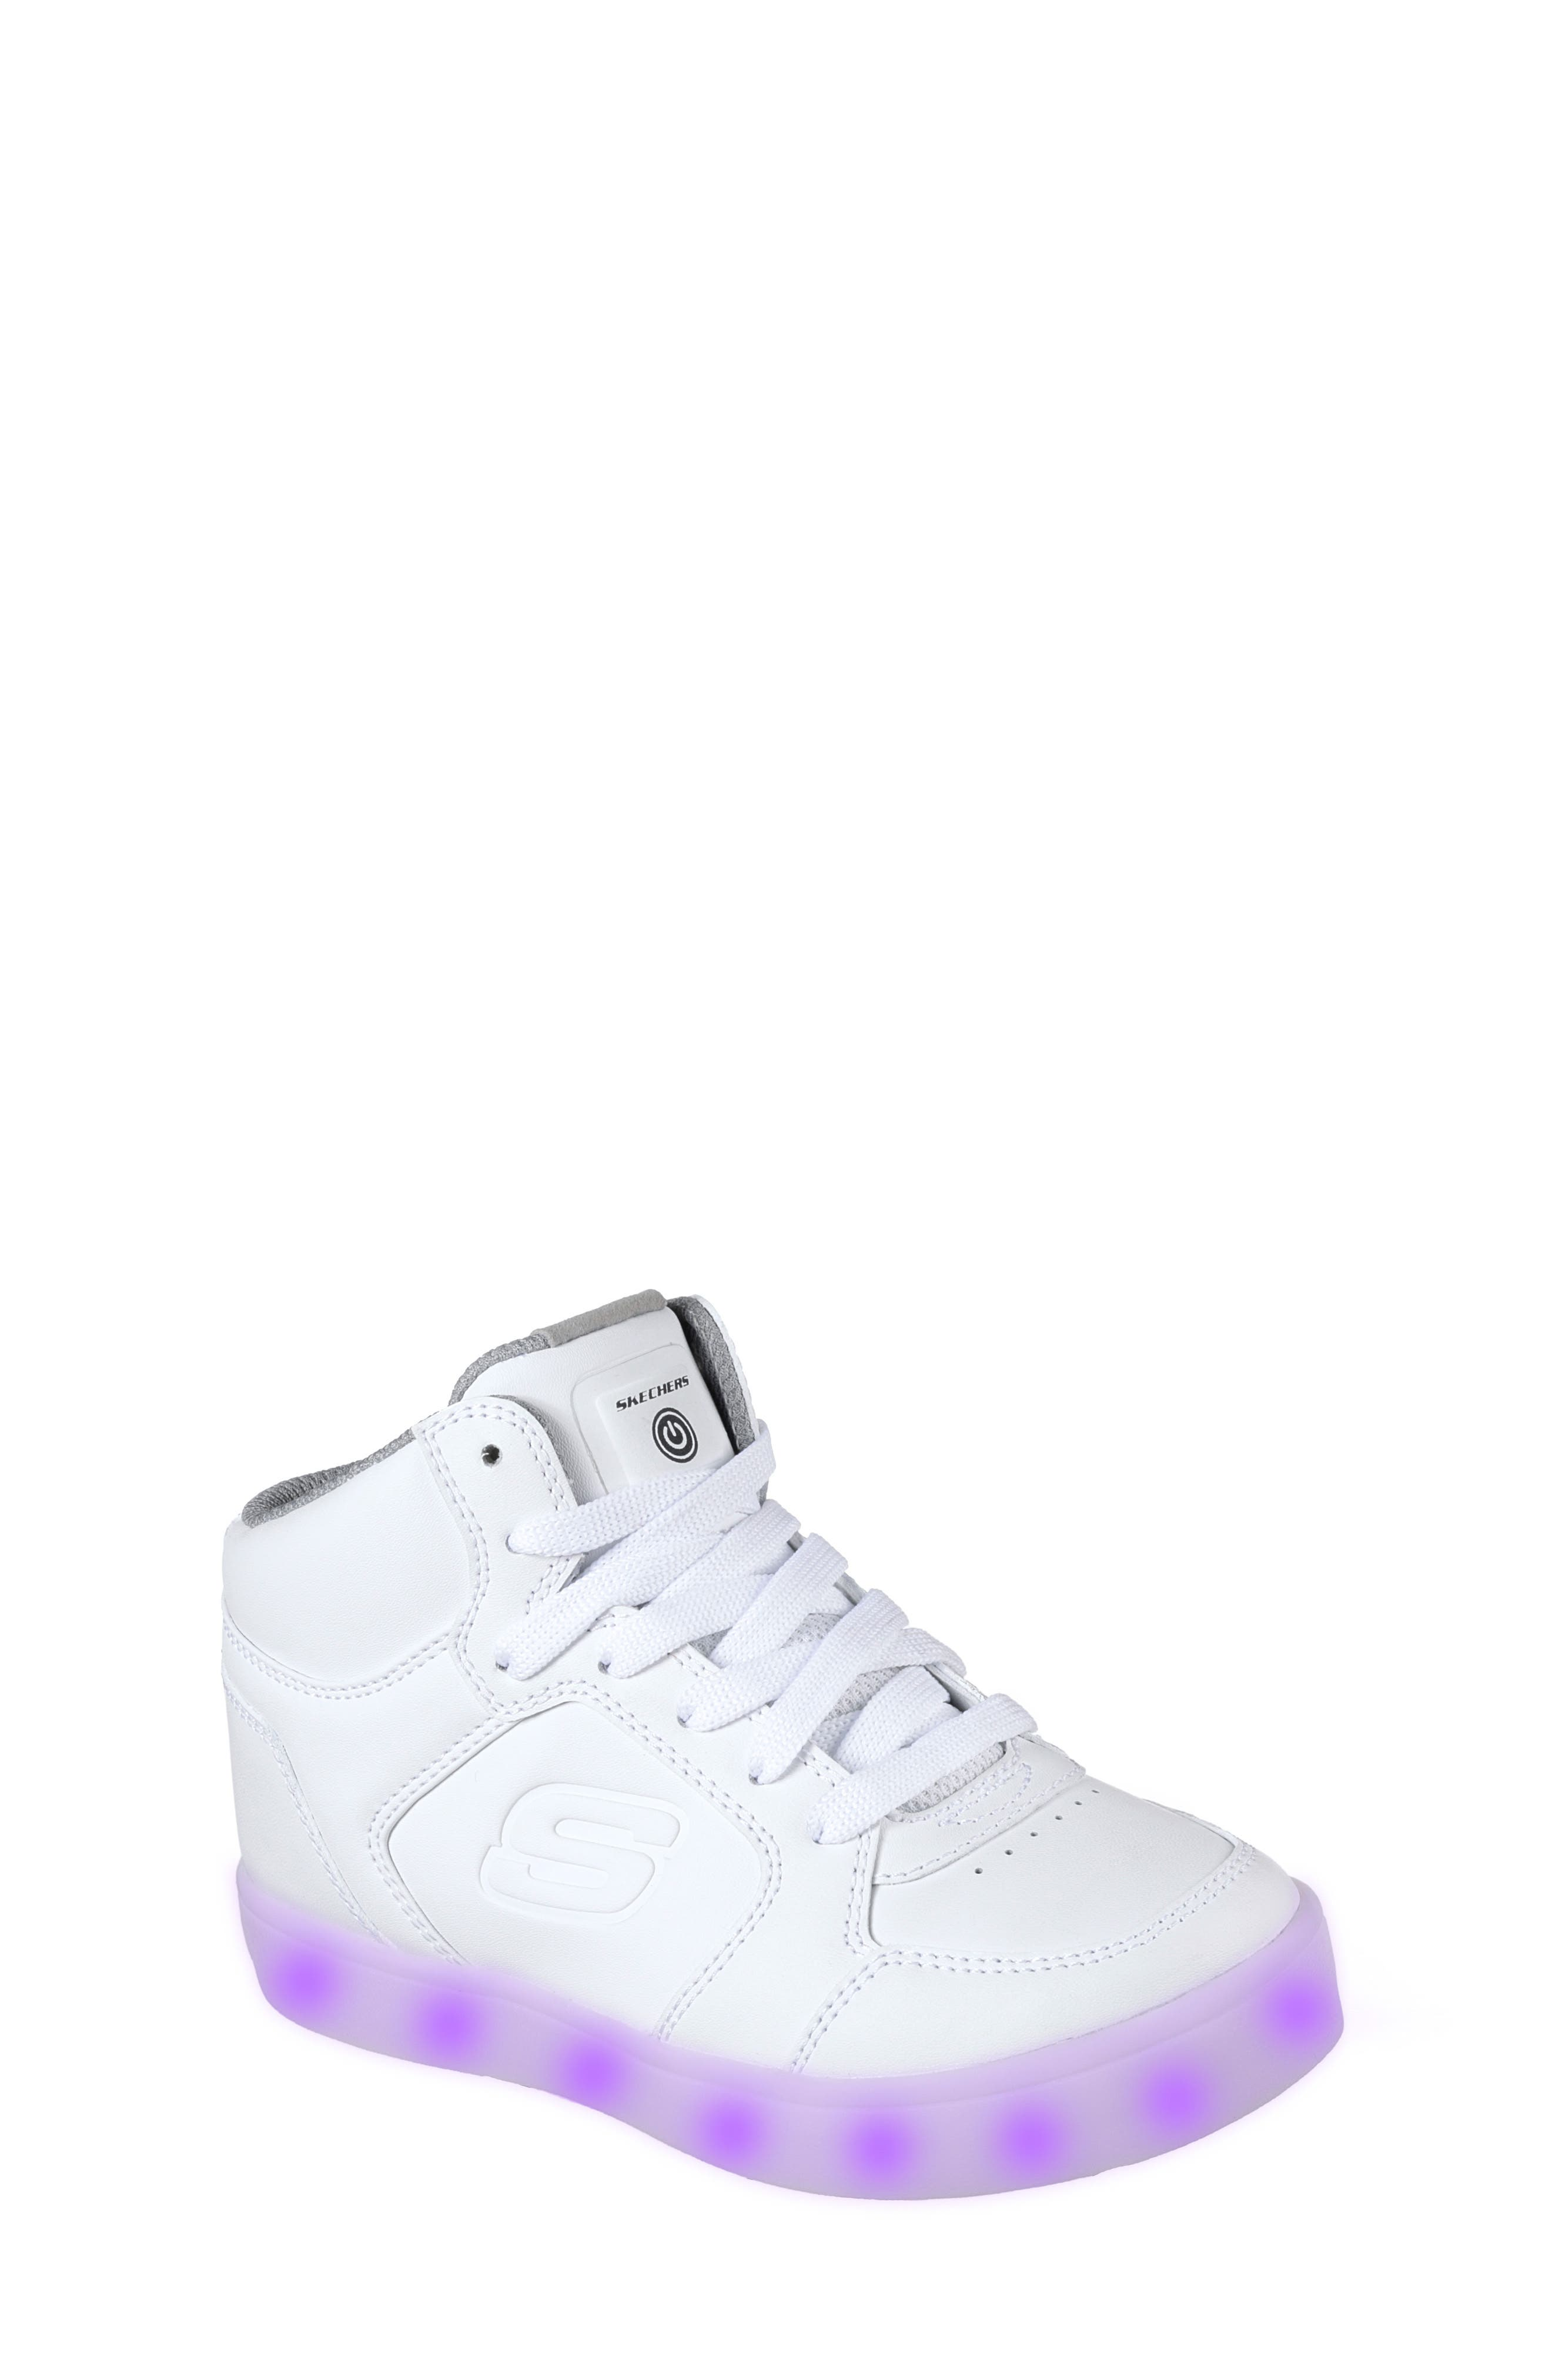 Main Image - SKECHERS Energy Lights Sneaker (Toddler, Little Kid & Big Kid)